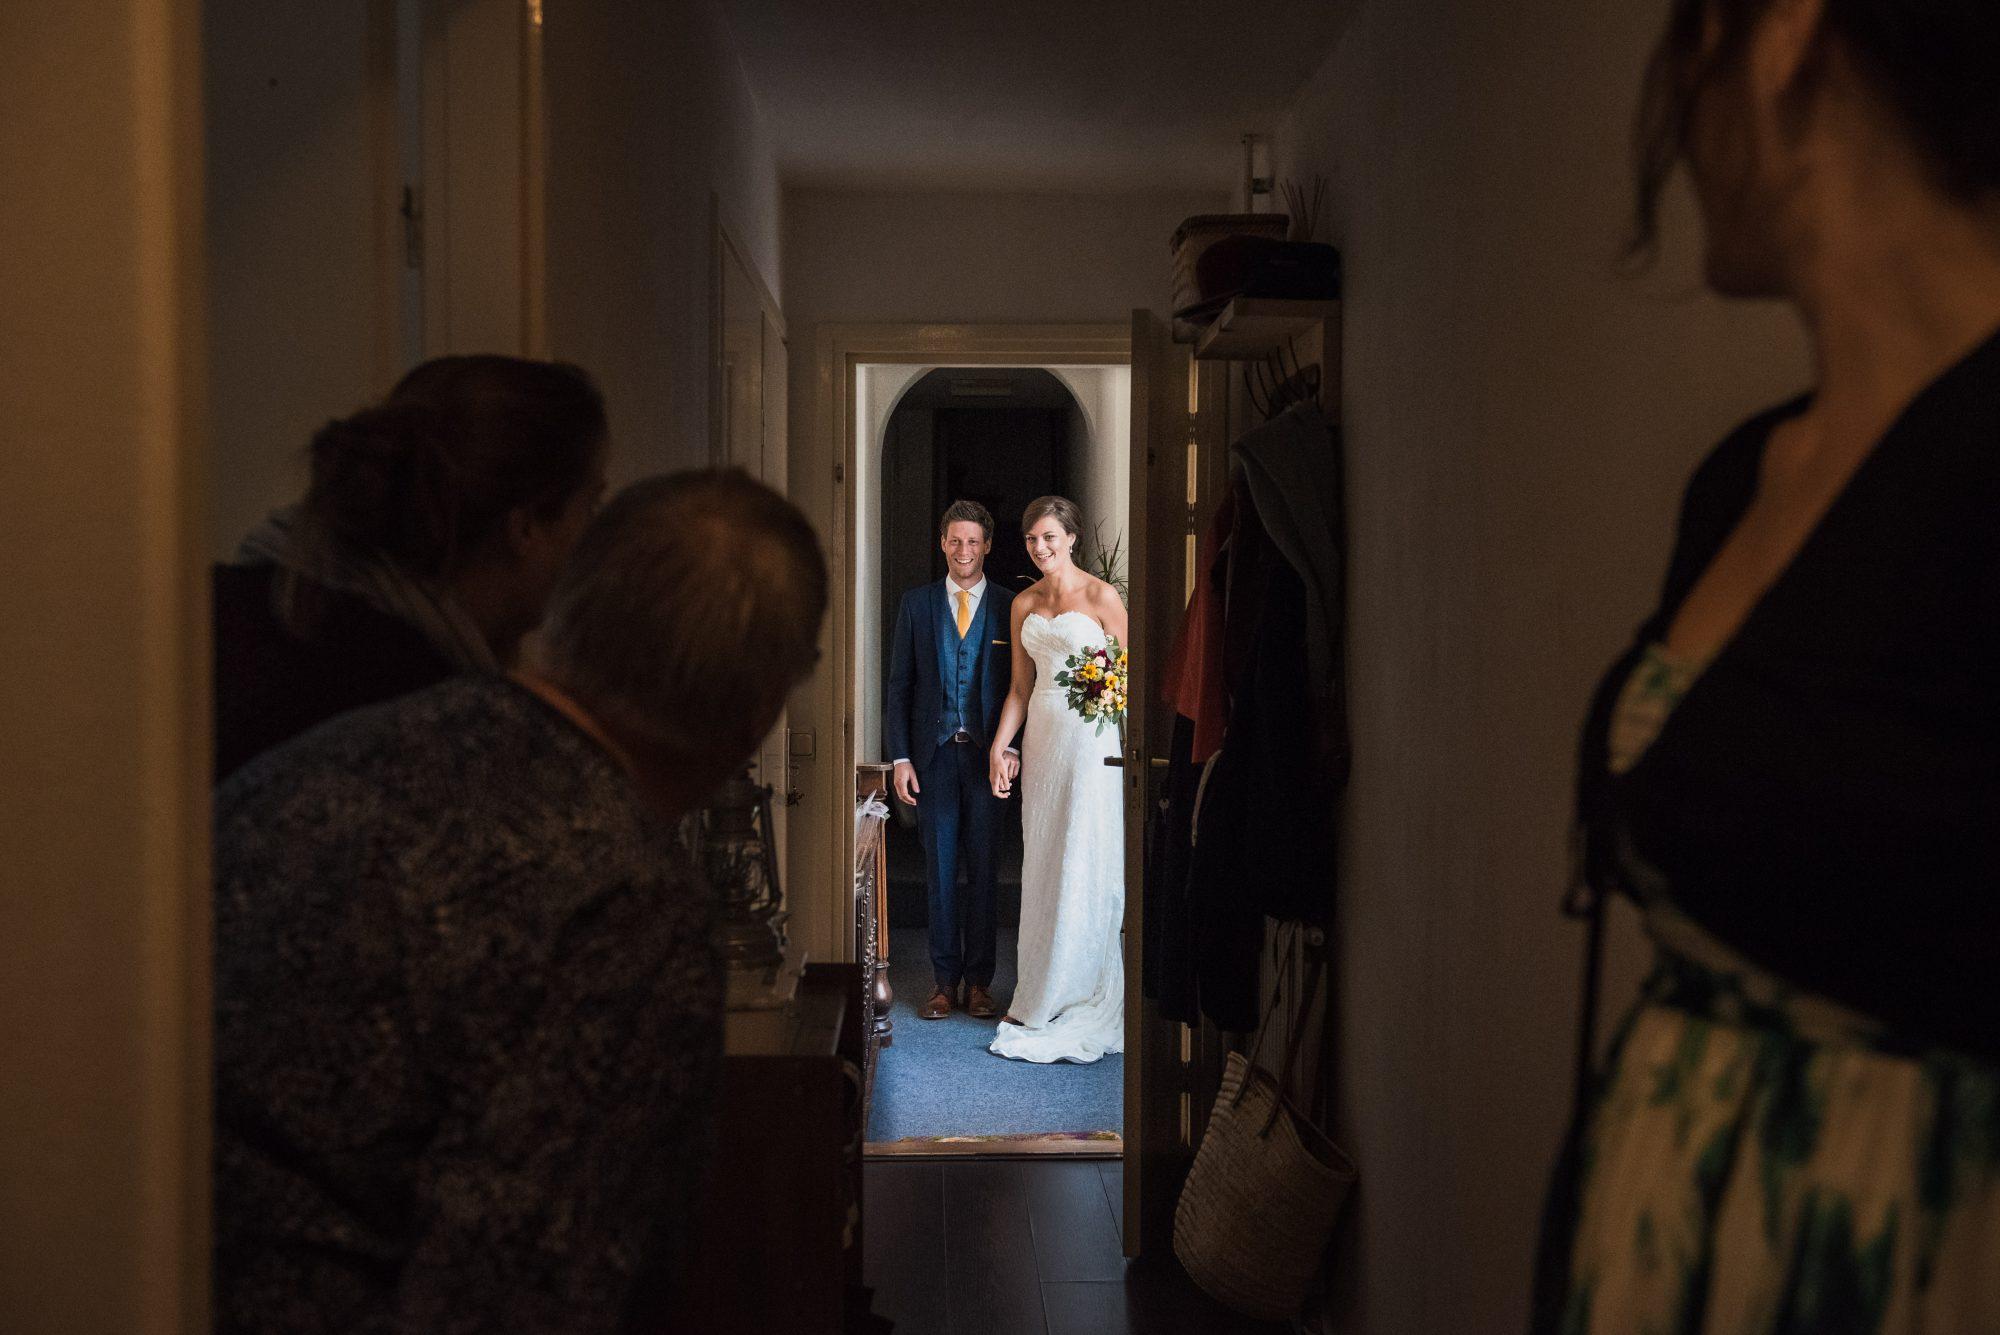 bruiloft-roland-annewil-125